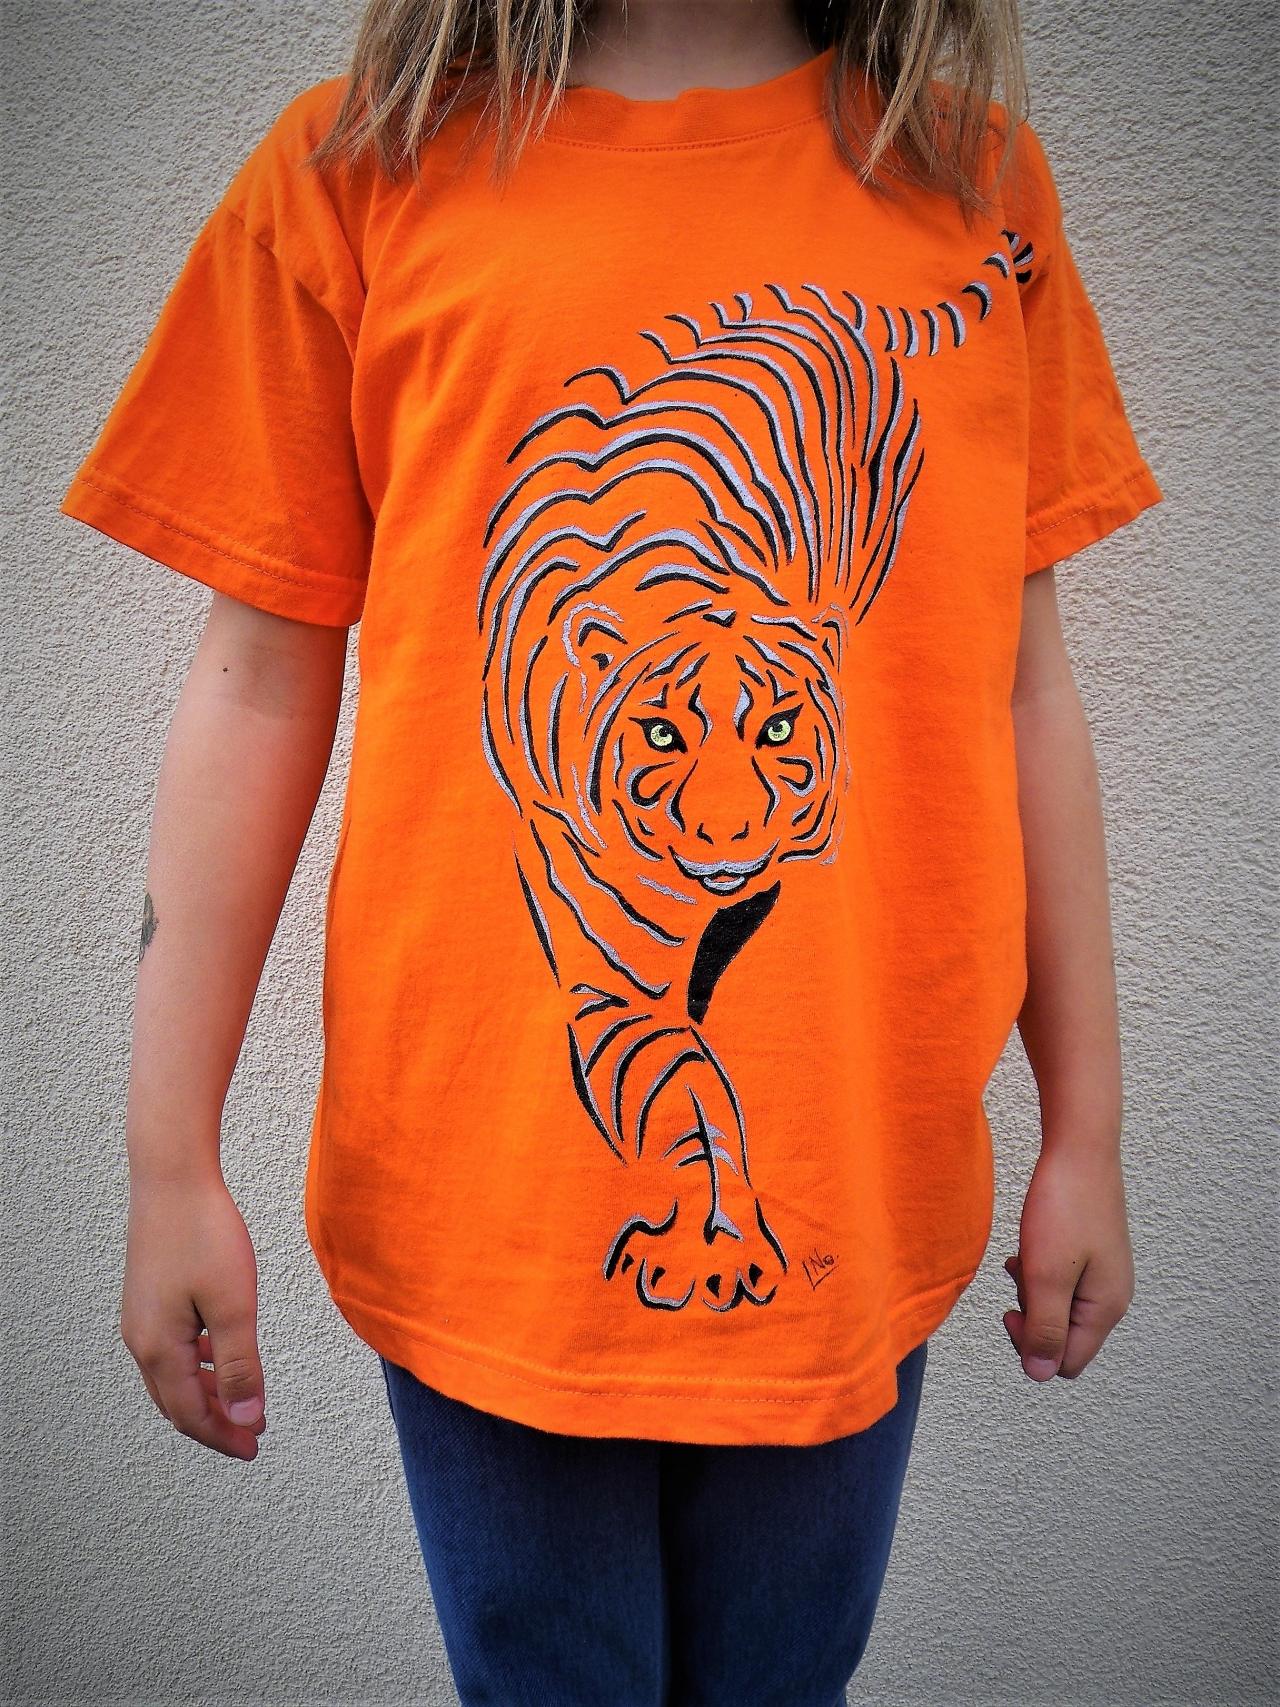 tee shirt horoscope chinois le tigre le buffle elles et no. Black Bedroom Furniture Sets. Home Design Ideas